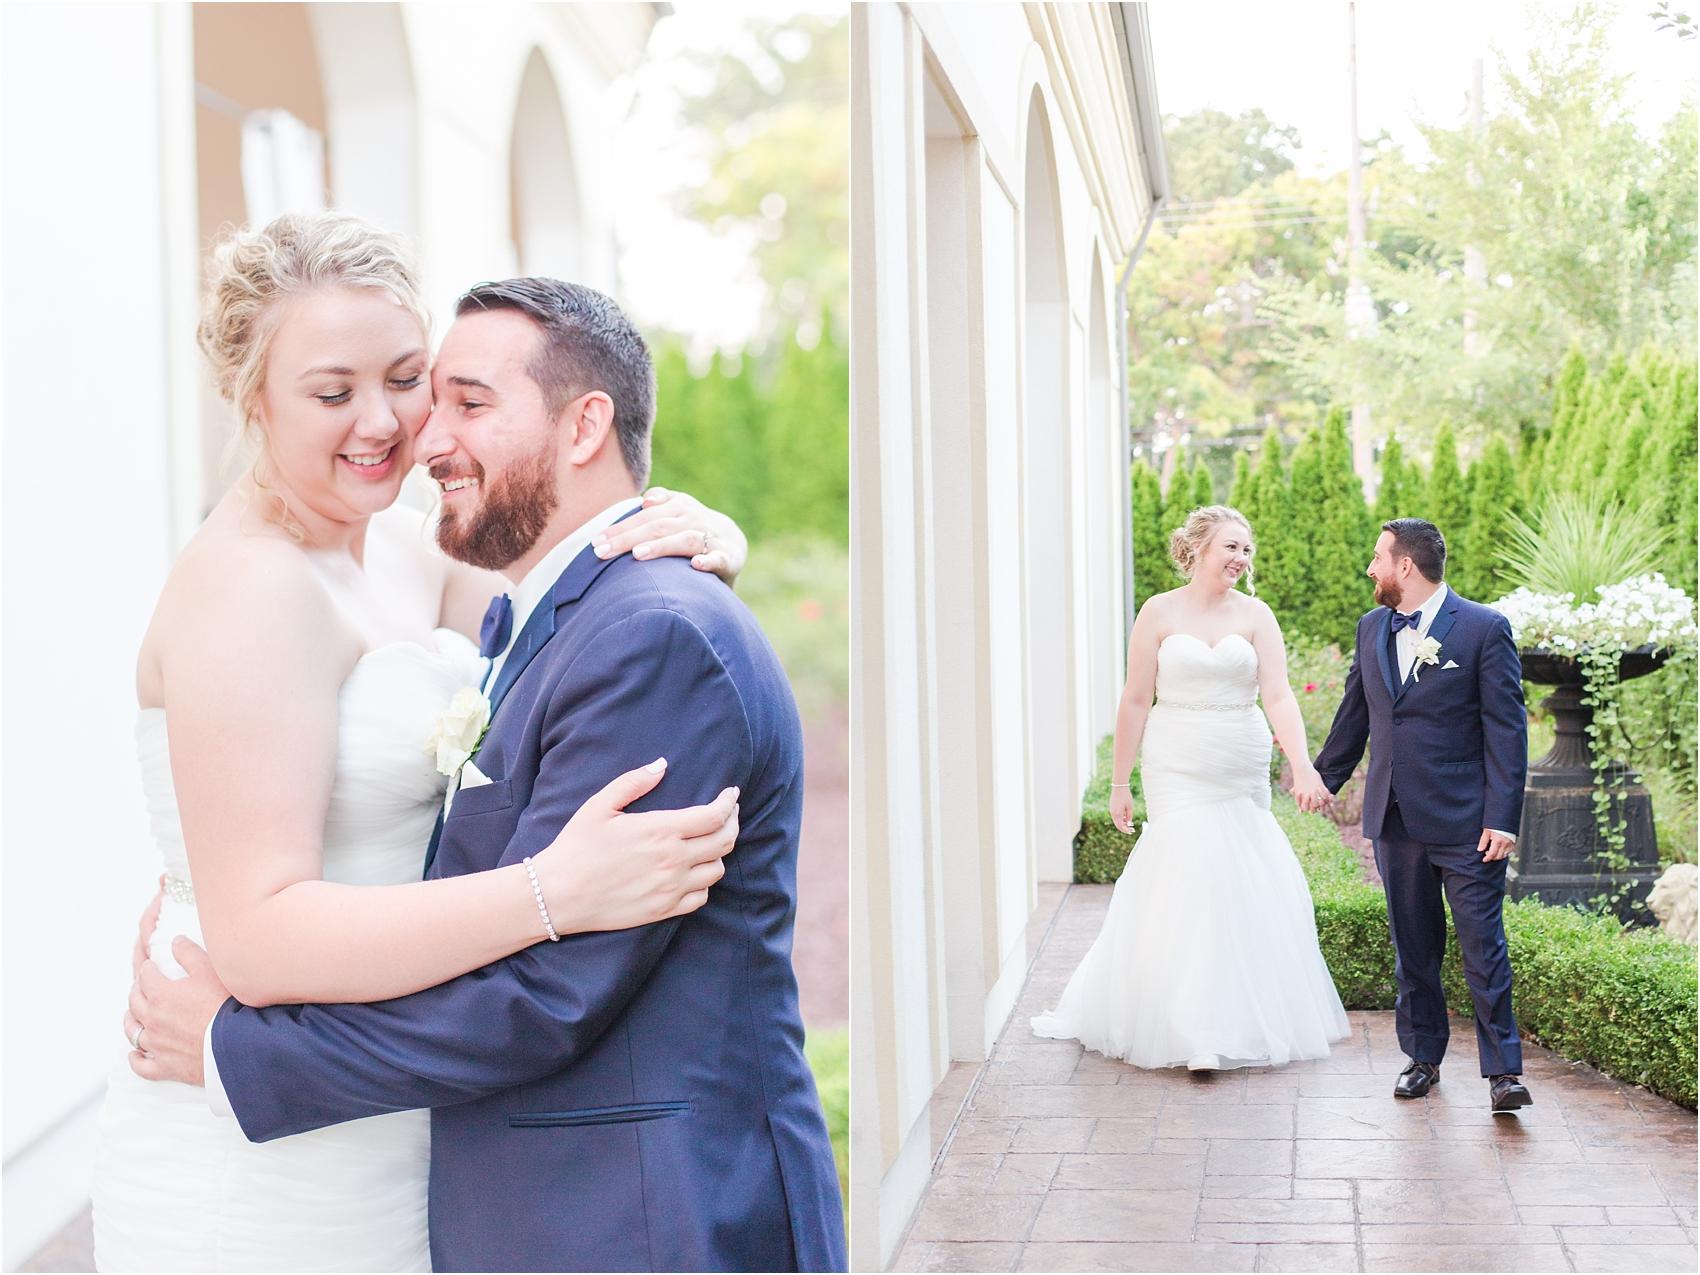 joyful-and-candid-navy-blush-wedding-photos-at-crystal-gardens-in-howell-mi-by-courtney-carolyn-photography_0109.jpg